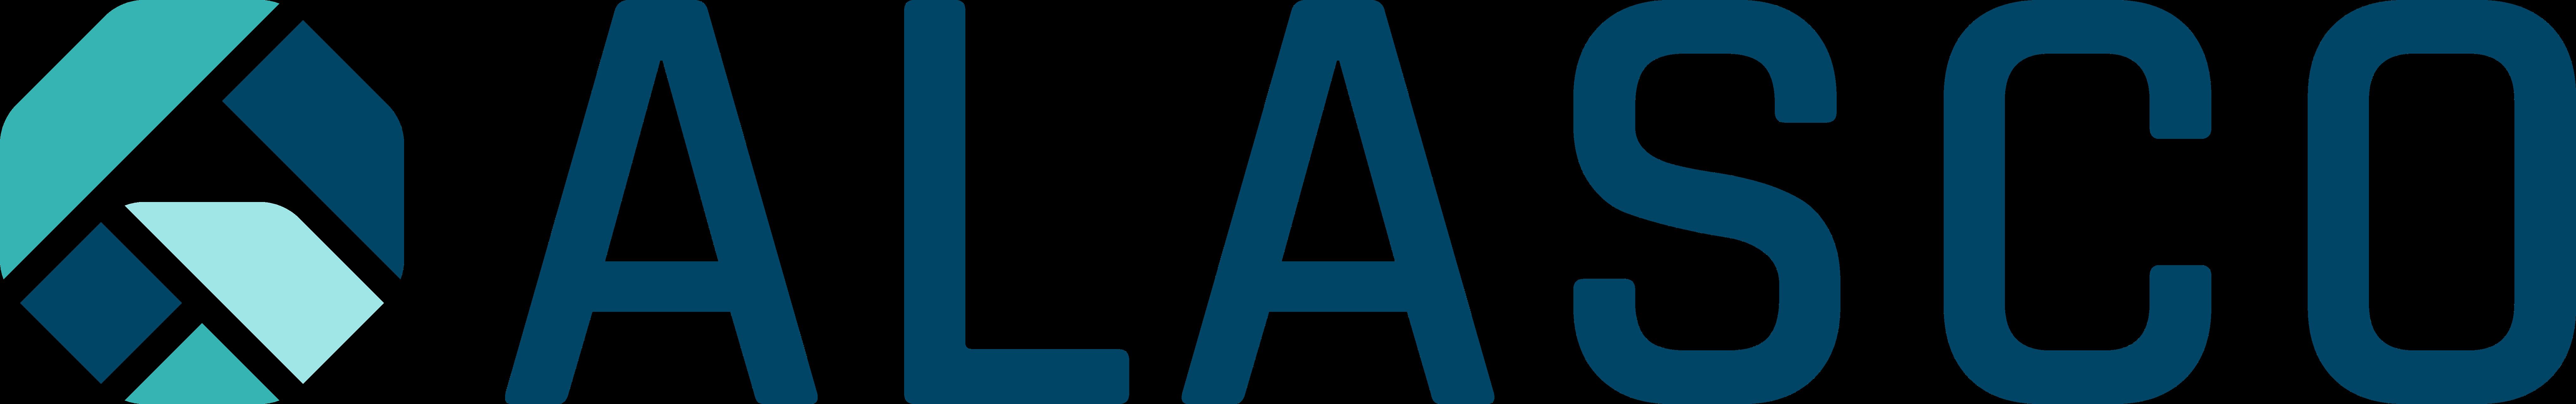 Logotype-1